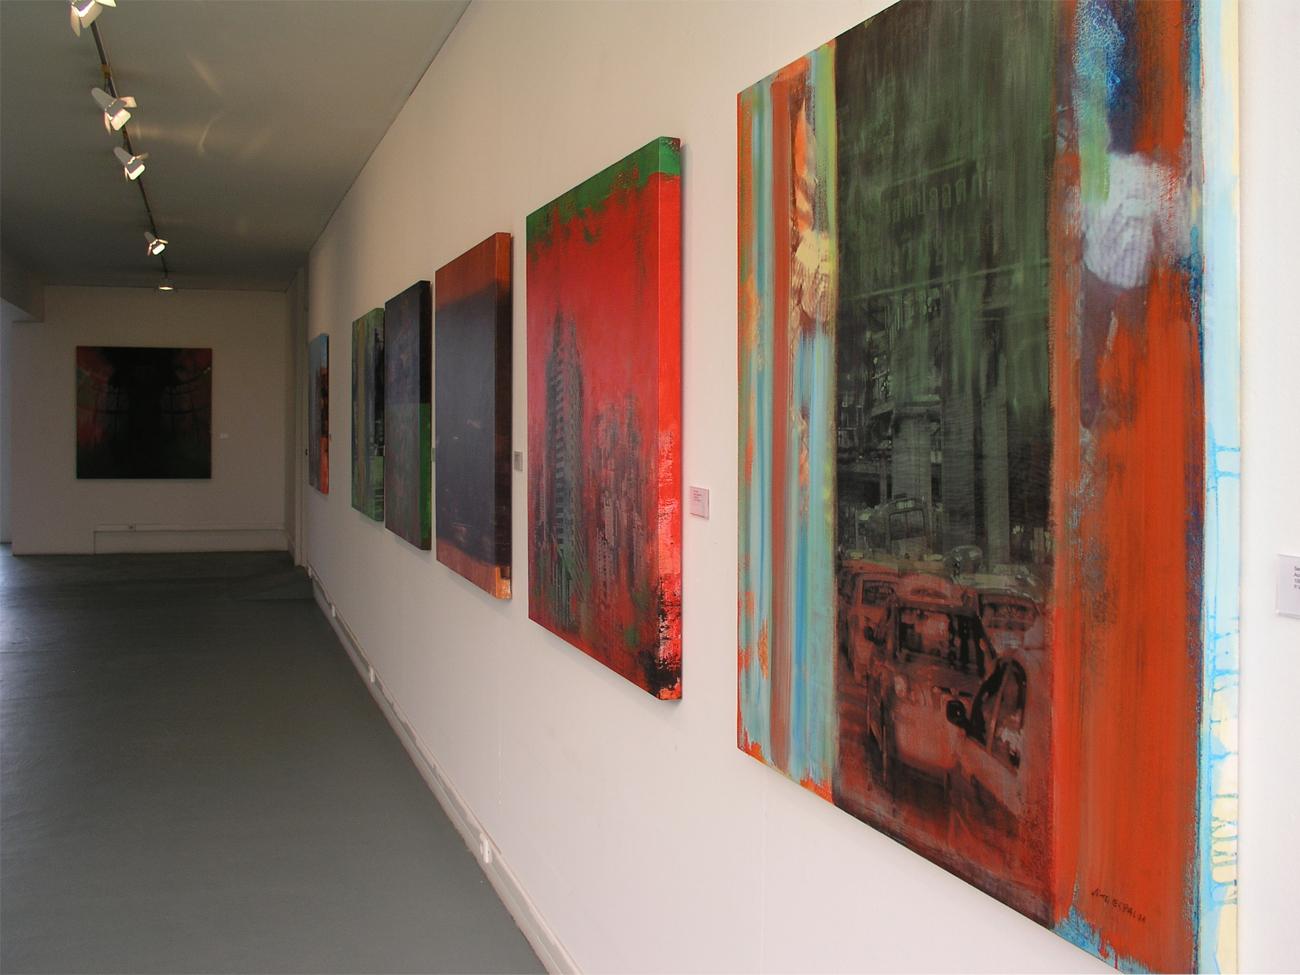 Ecce Urbi (2008)